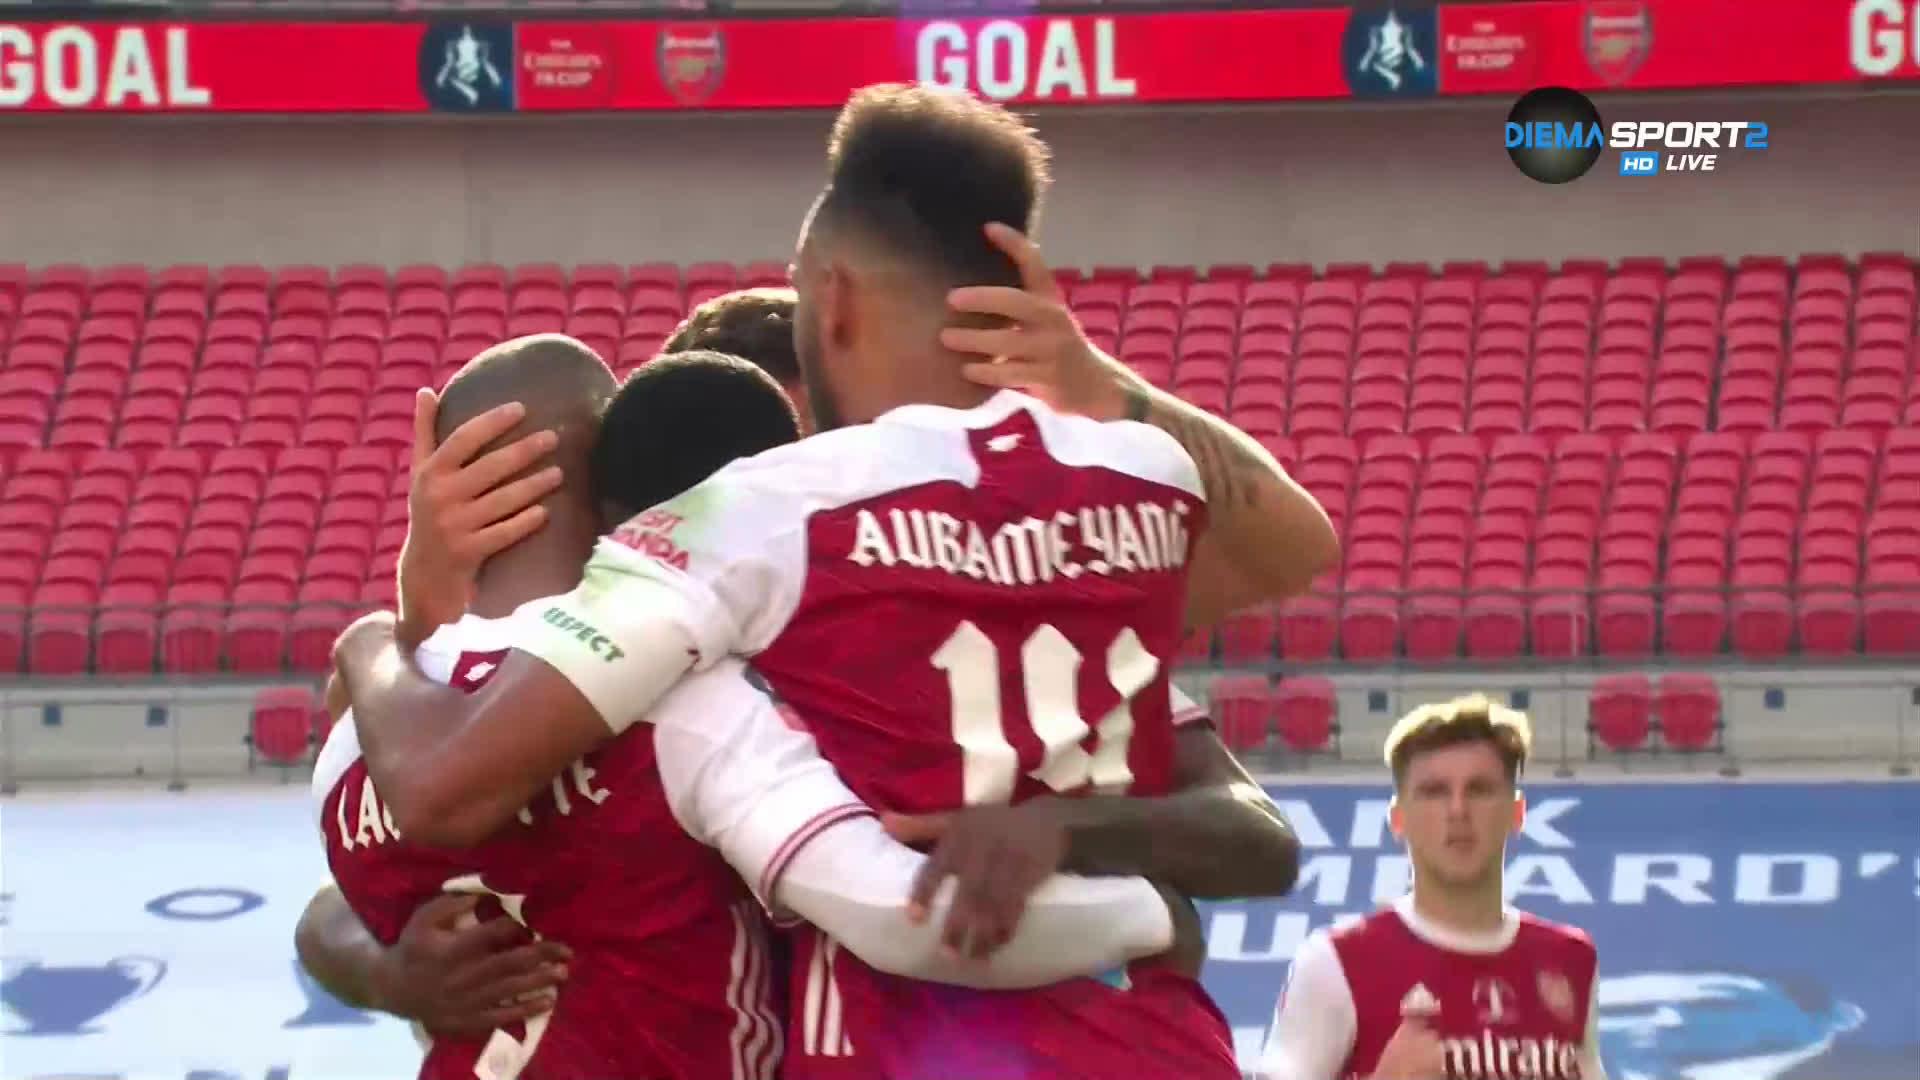 Арсенал - Челси 2:1 /репортаж/